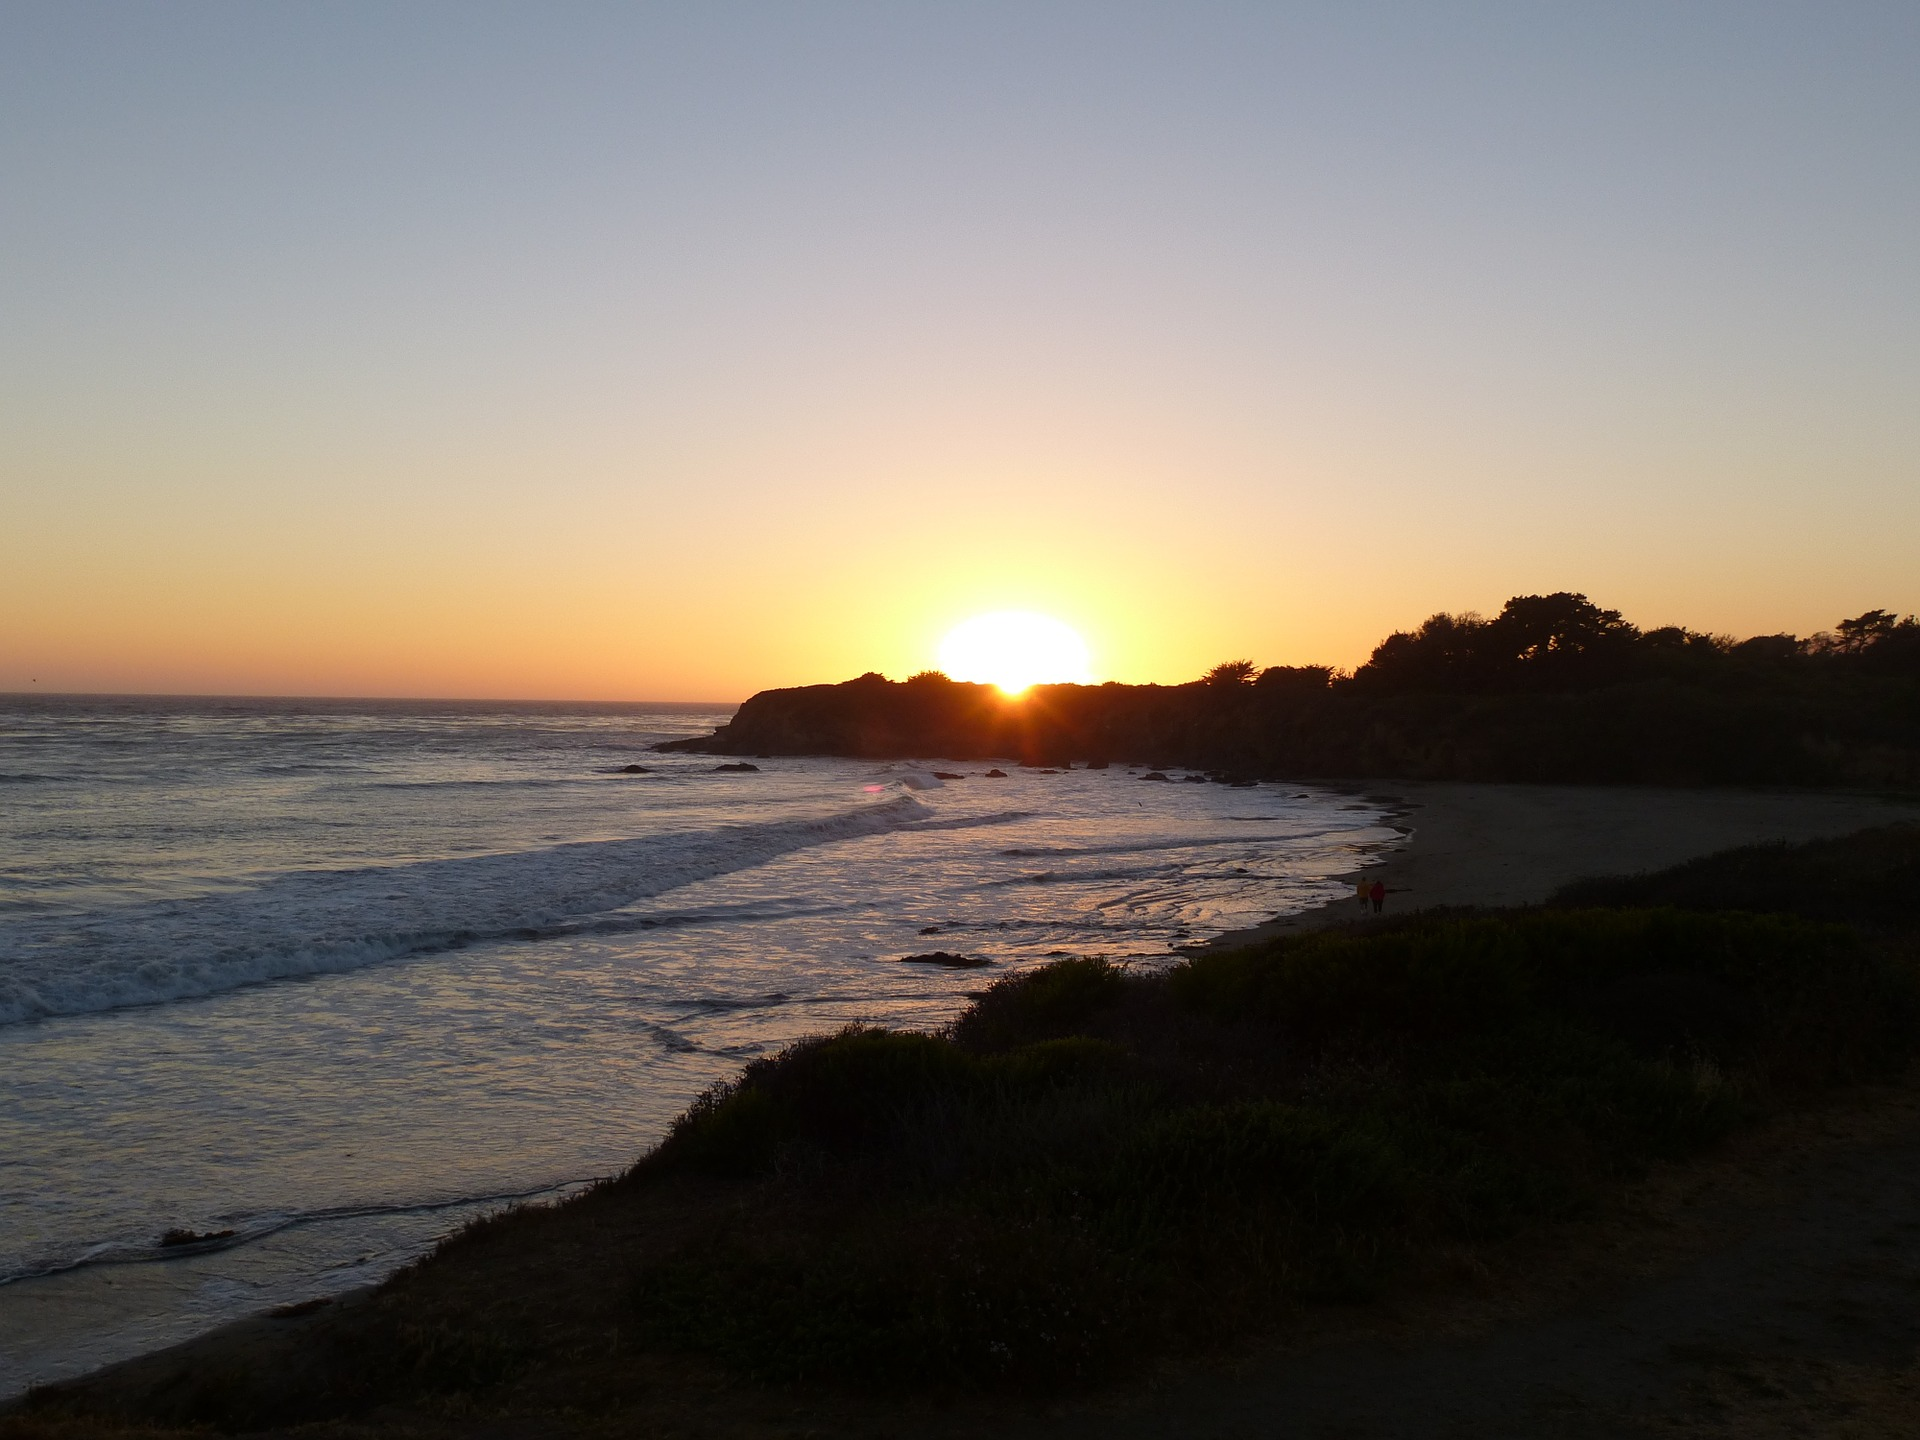 sunset-1248359_1920.jpg